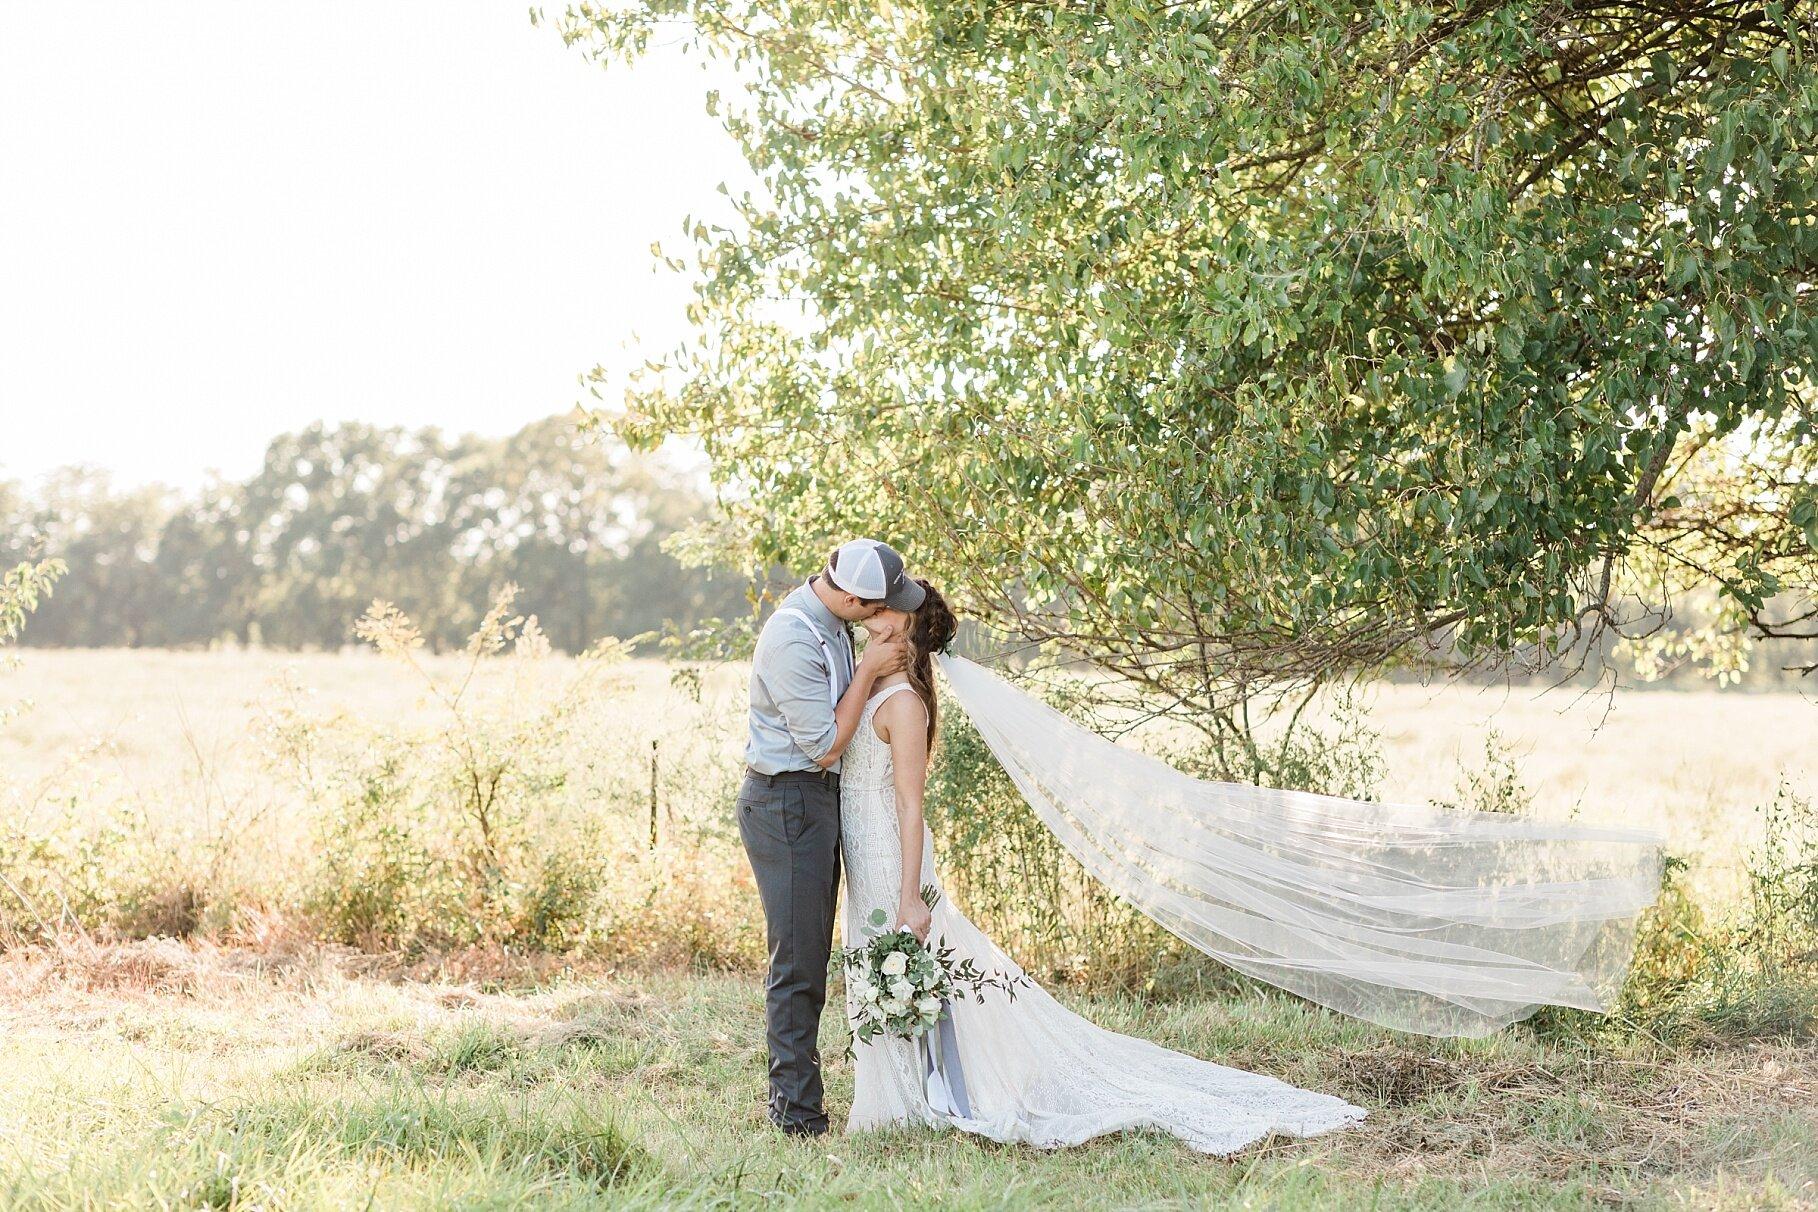 Earth-Toned Wedding by KKP Associate Wedding Photographer and Kelsi Kliethermes Photography Best Columbia Missouri Wedding Photographer_0011.jpg